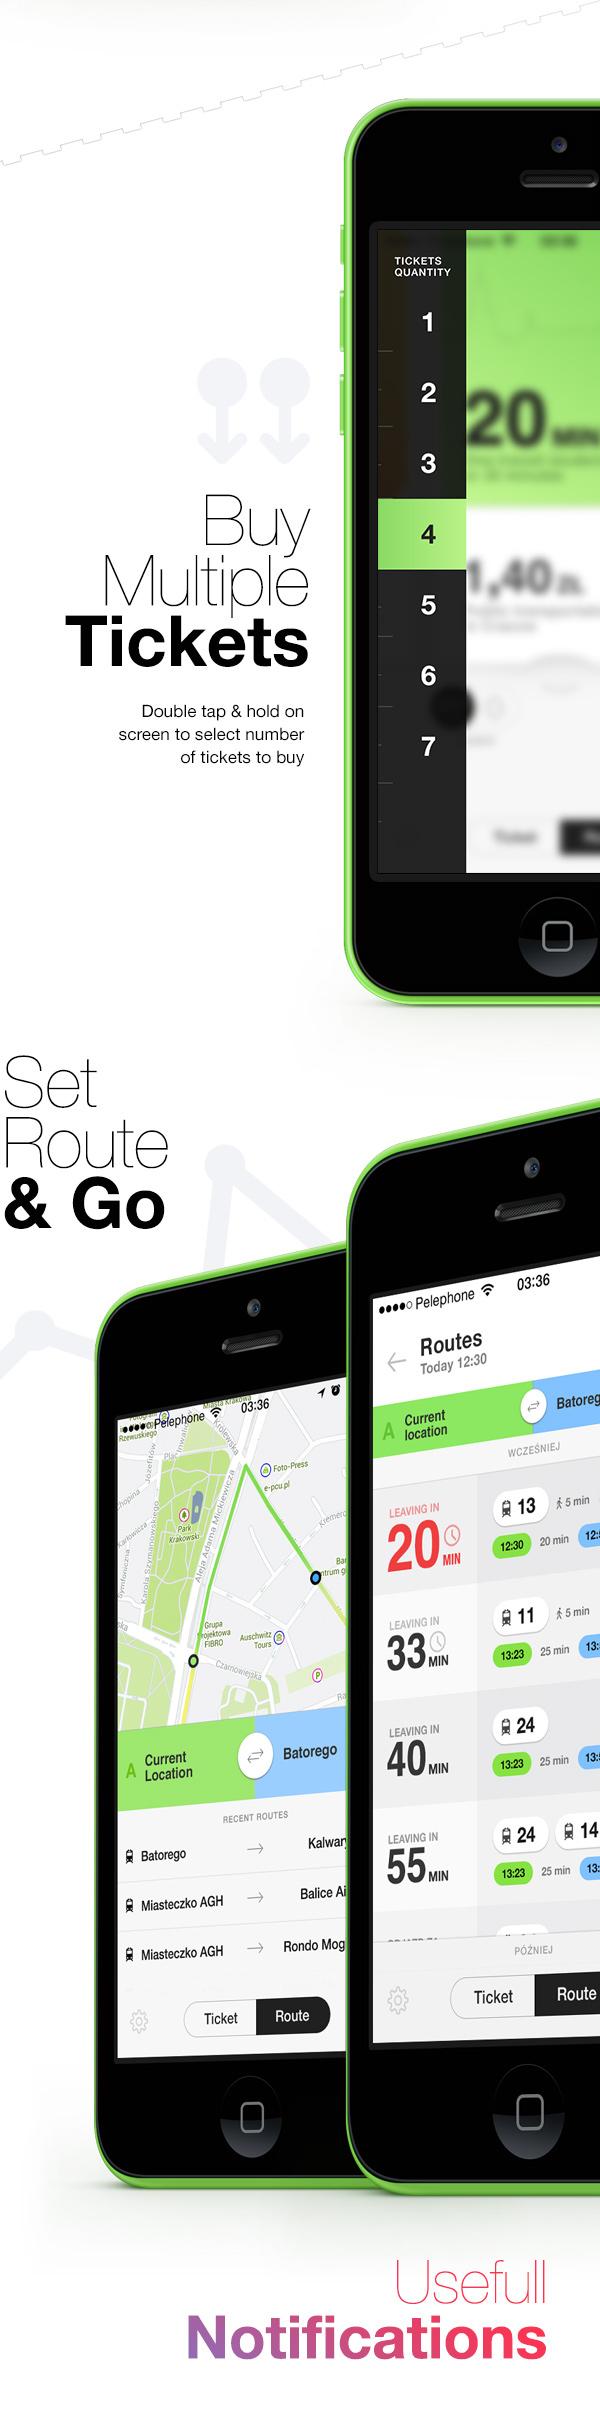 ticket train cracow krakow bilet samborek route time Transport motion design city app ios iphone